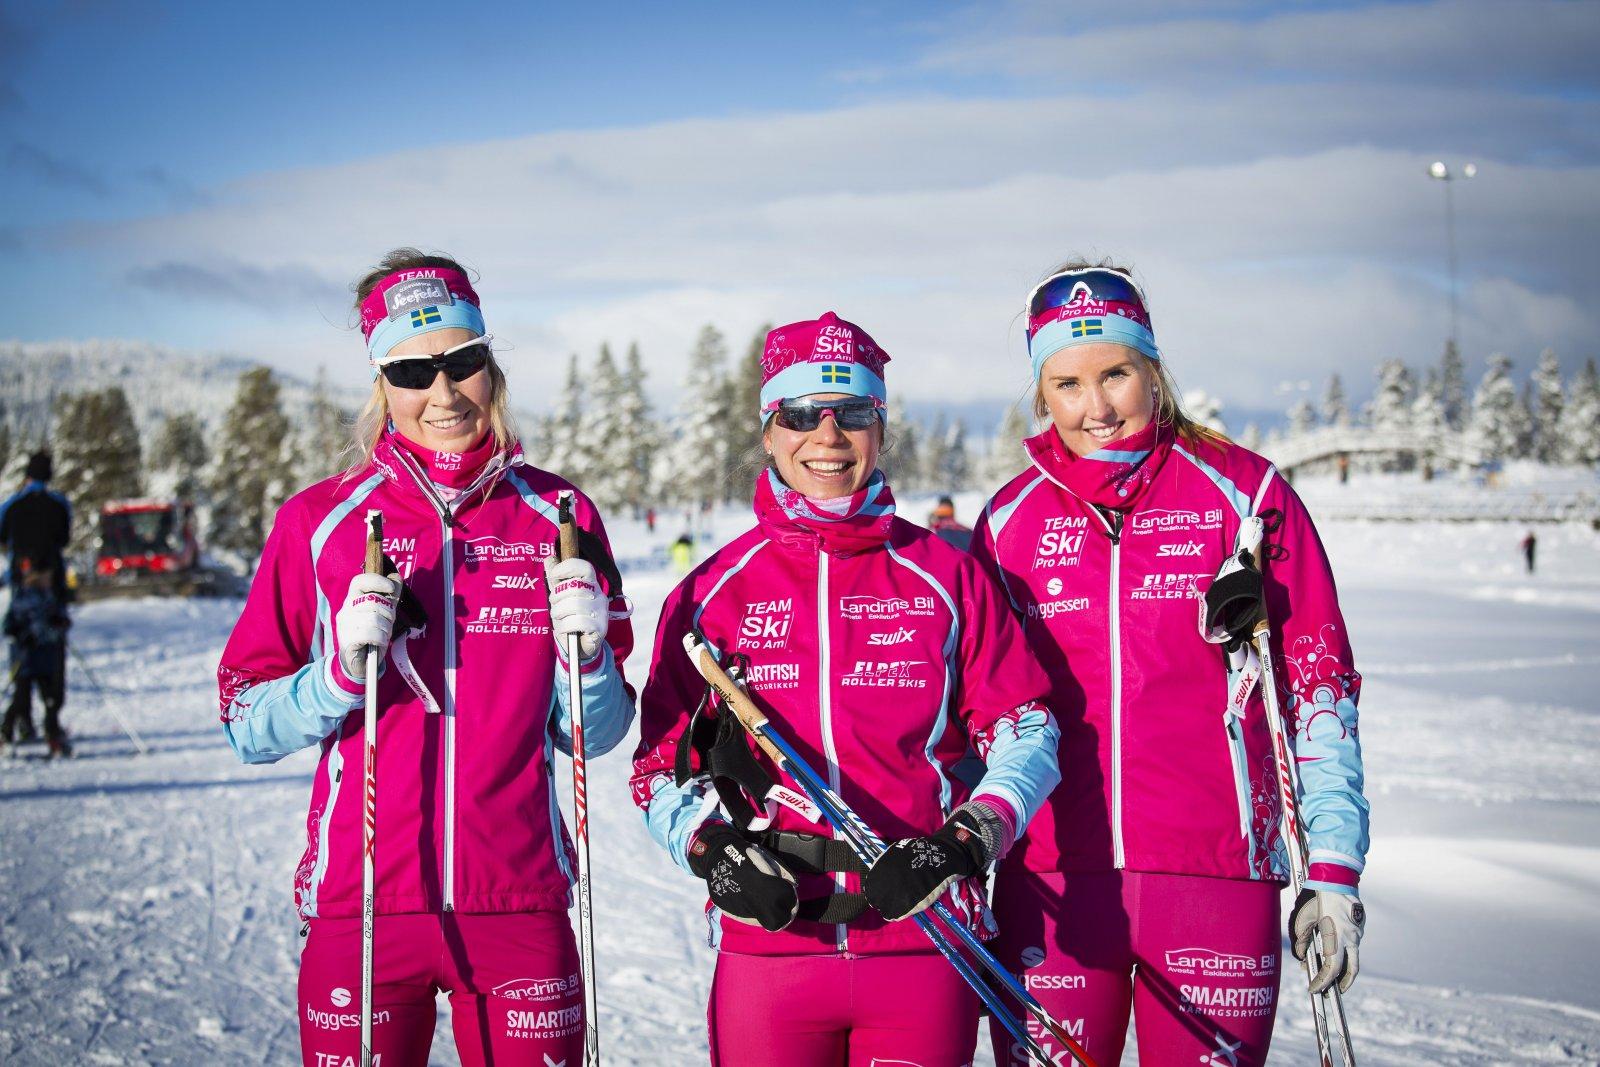 team-ski-_93a3909-kopia-webb